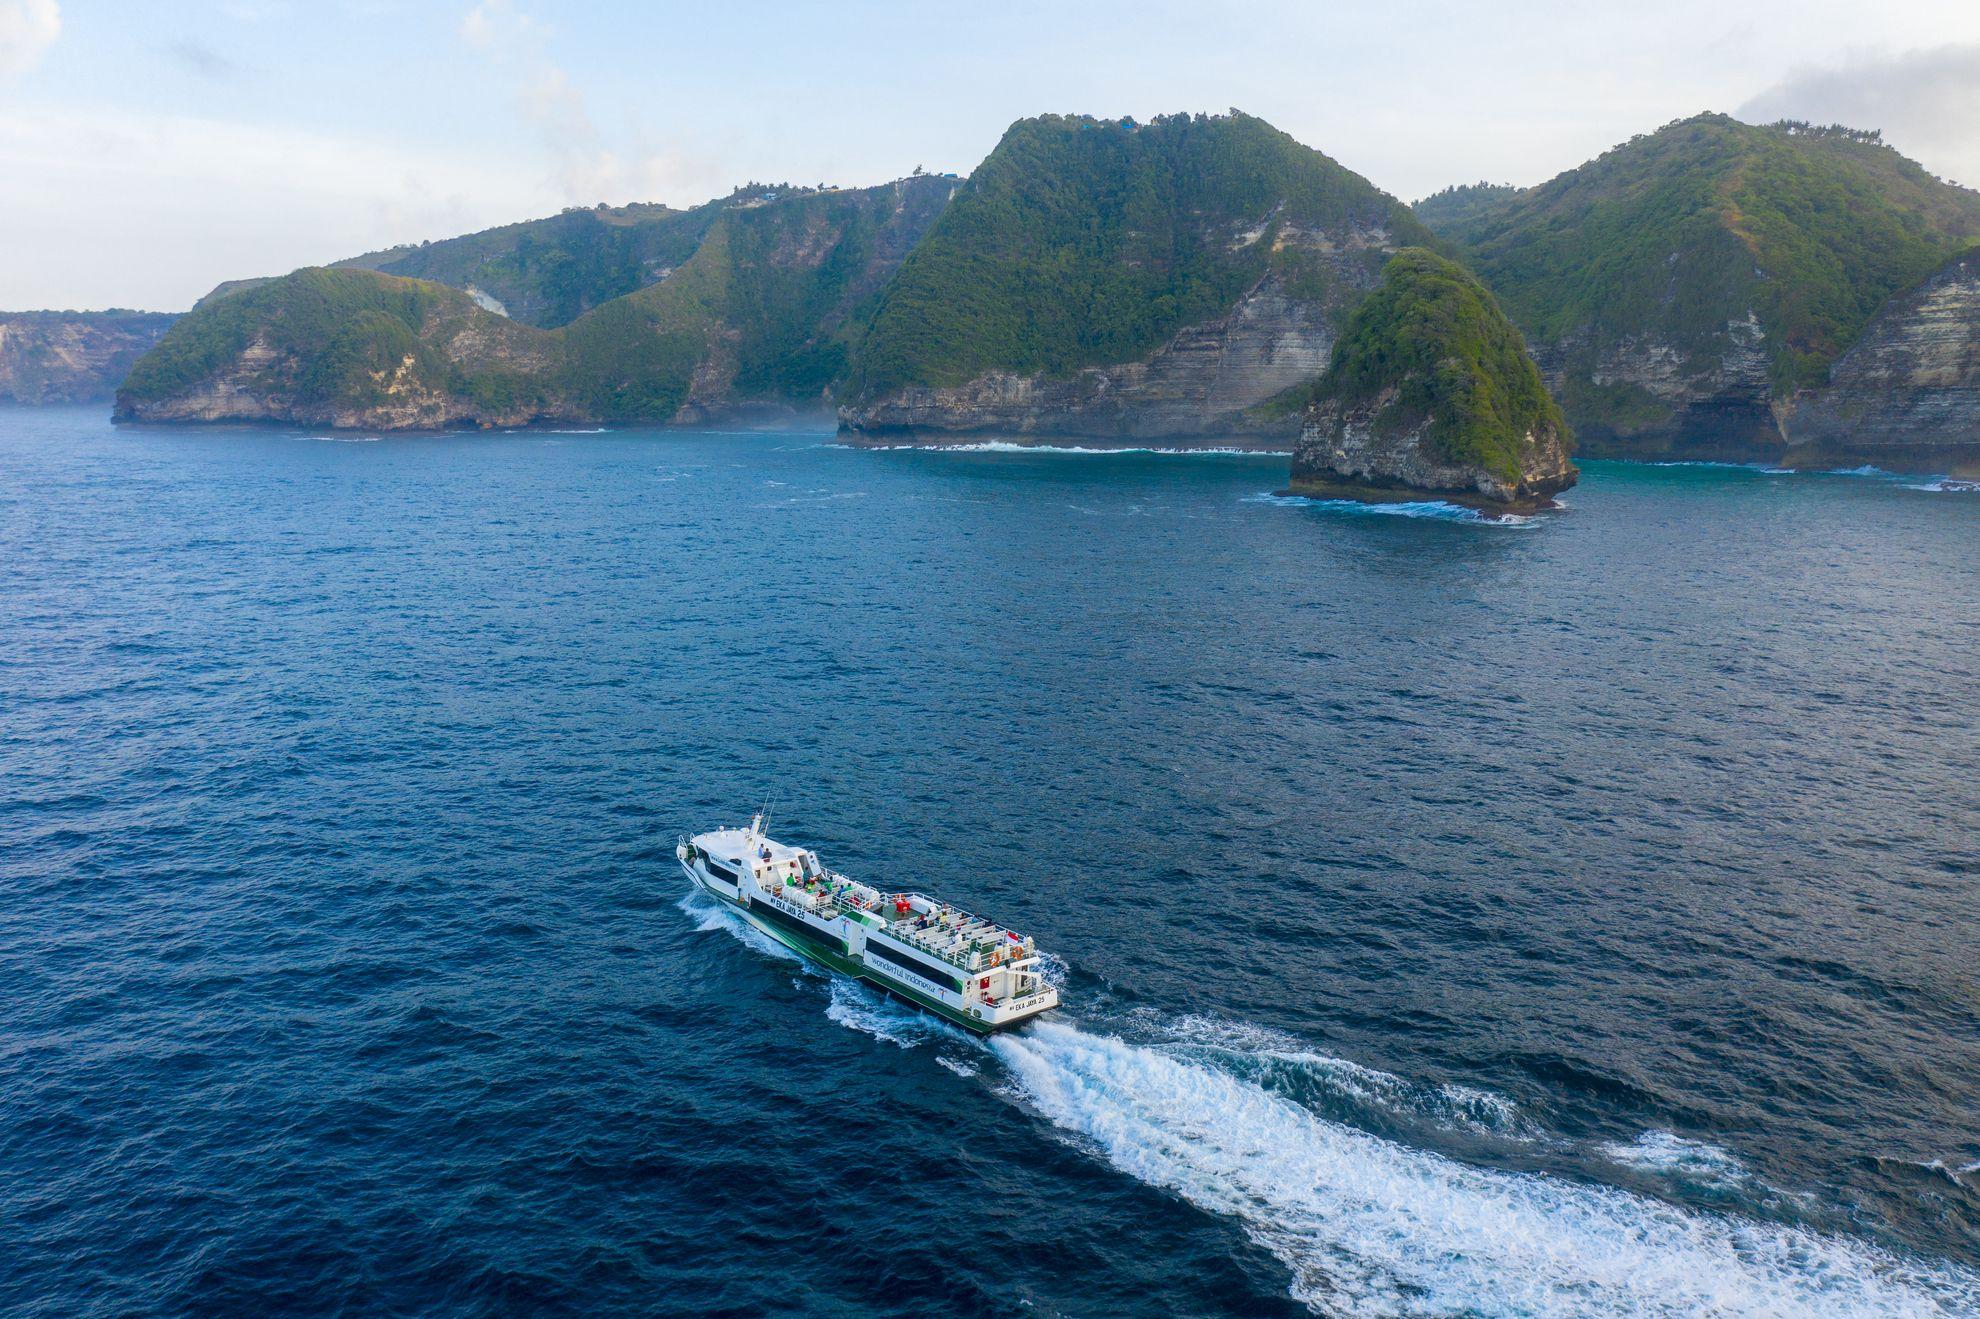 Tiket Eka Jaya Fastboat | Jaminan Harga Promo Termurah | Fastboat ke Gili, Bangsal, Lembongan, Nusa Penida